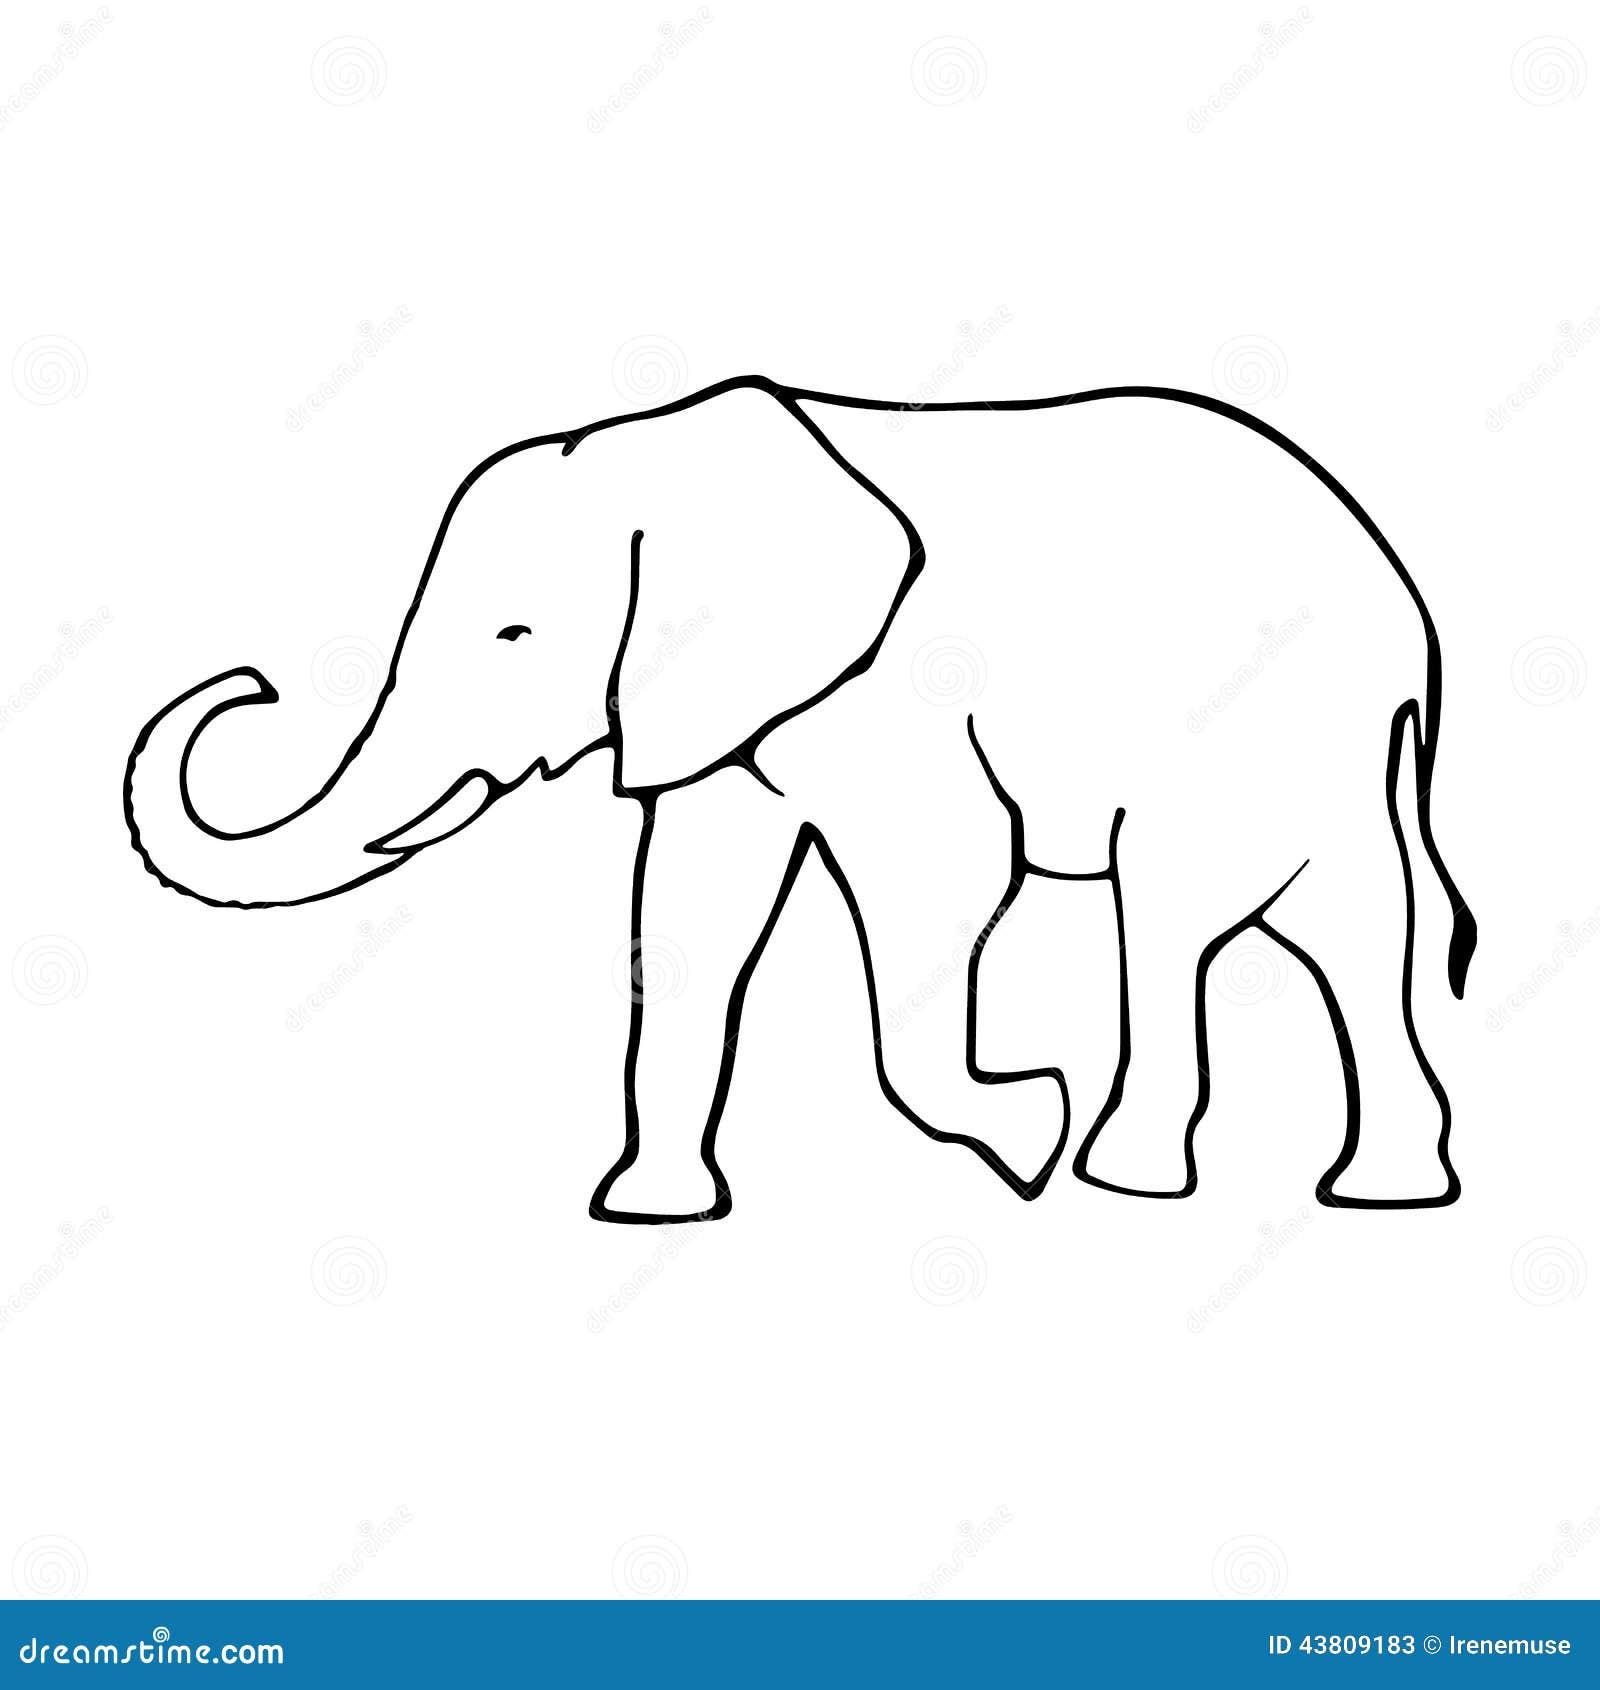 clipart elephant outline - photo #44